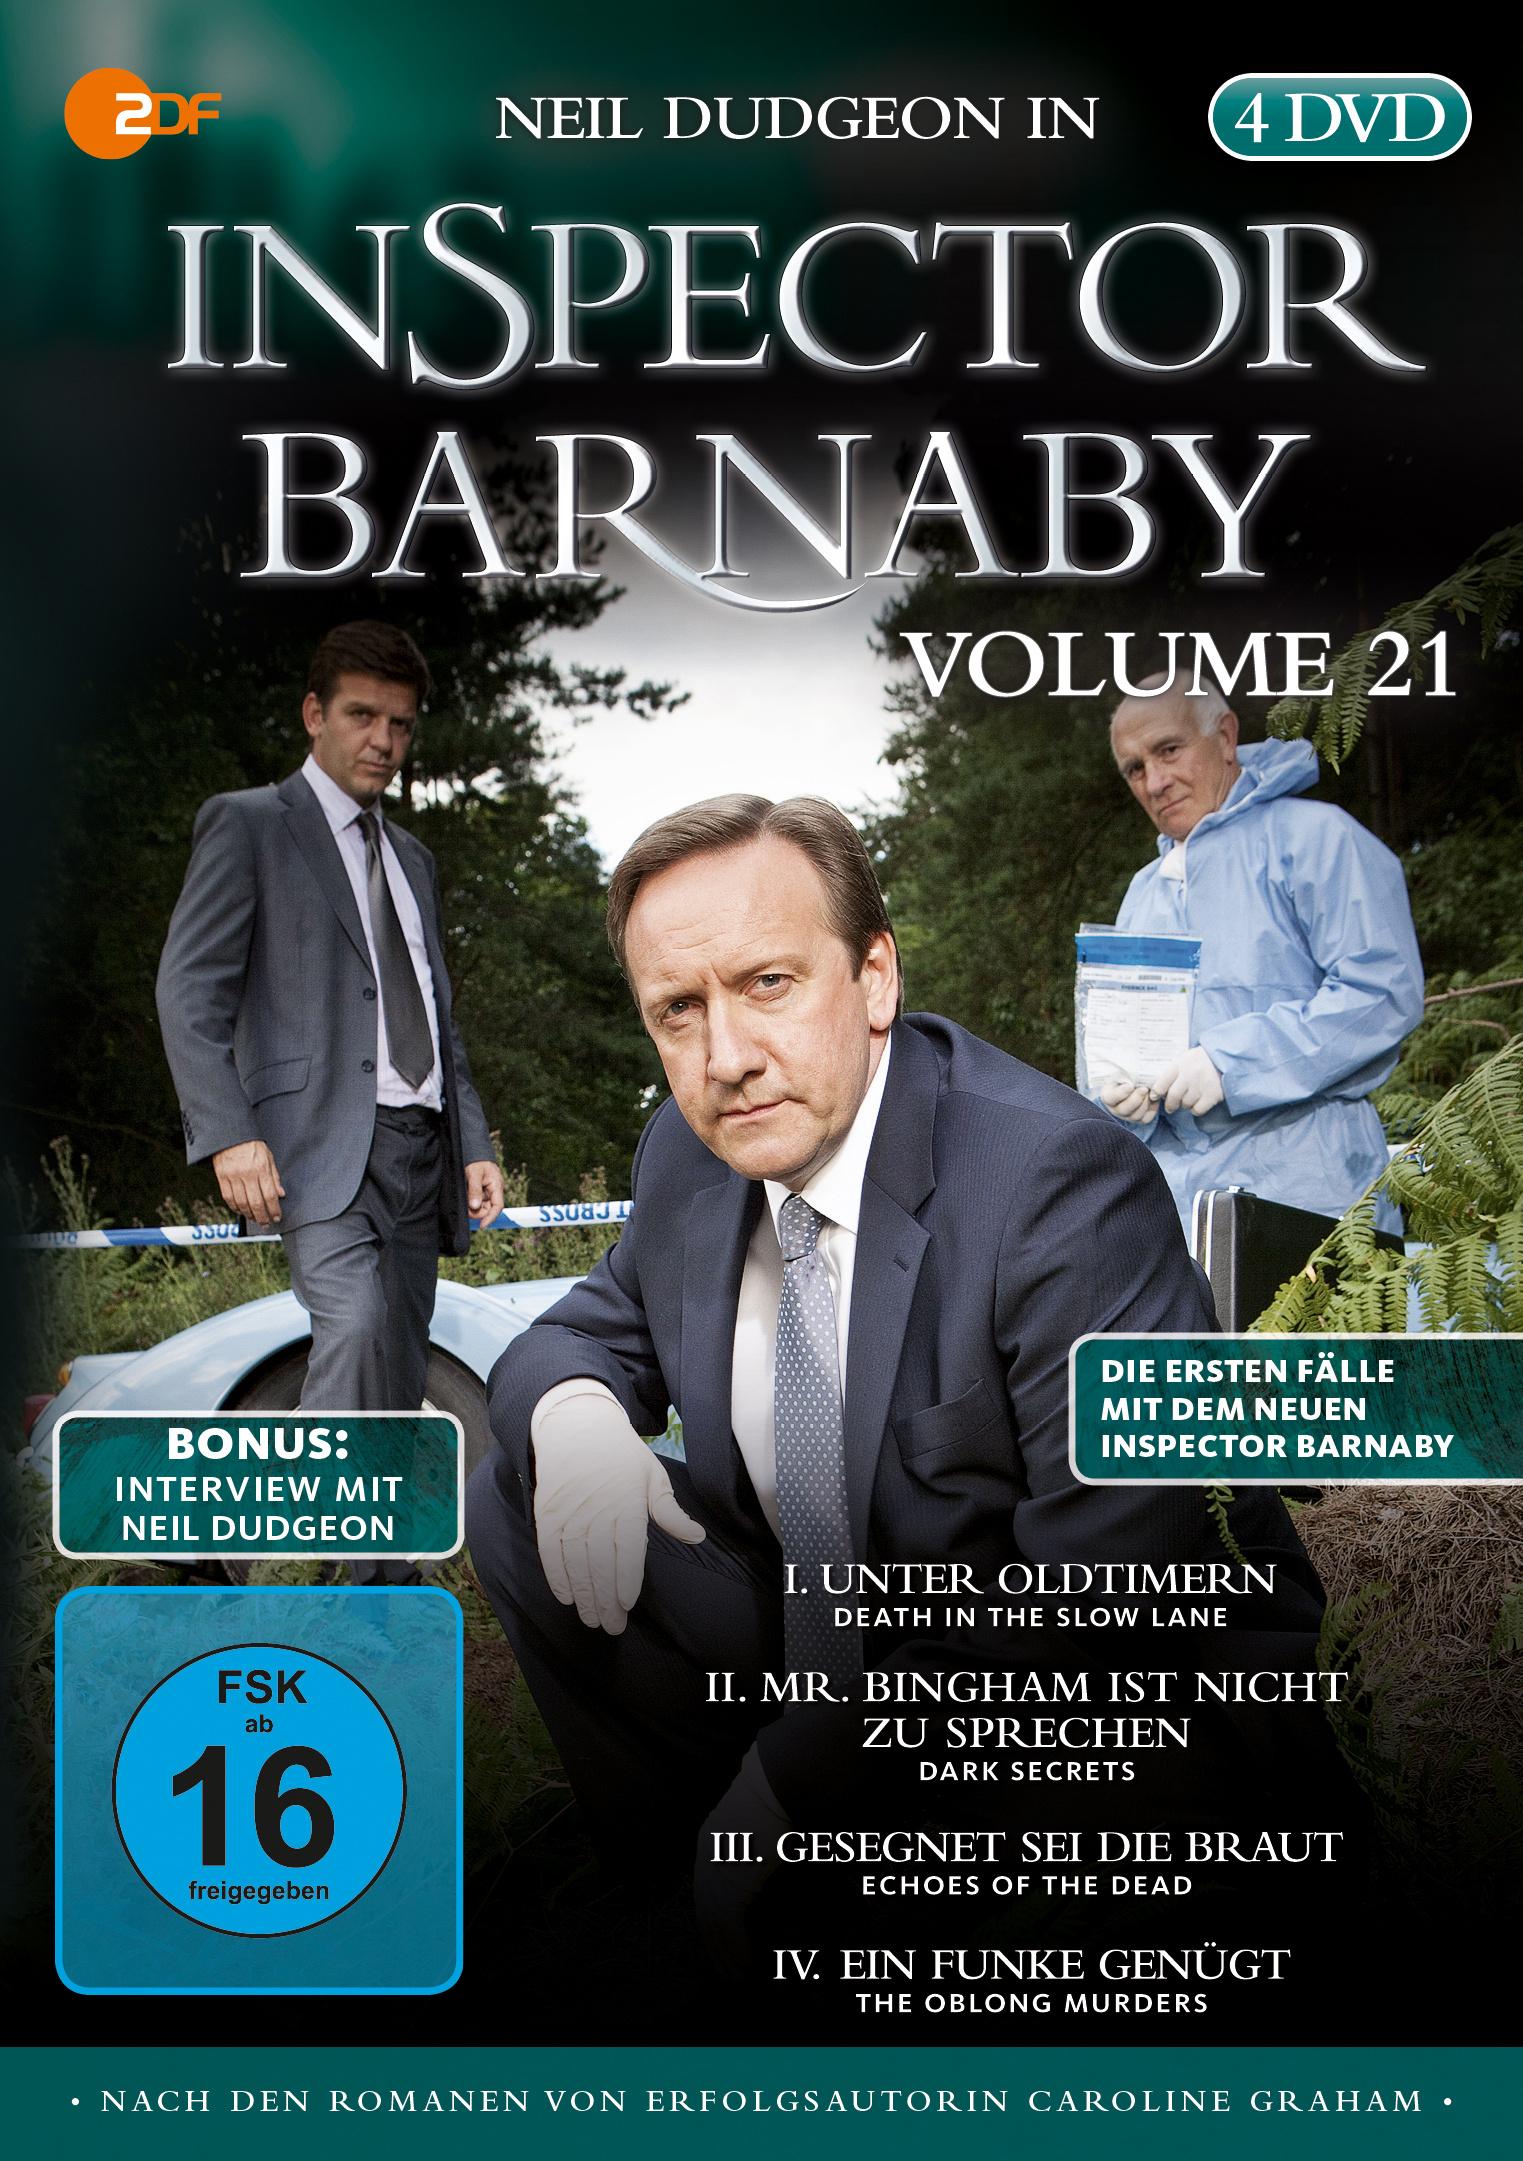 Image of Inspector Barnaby Vol. 21